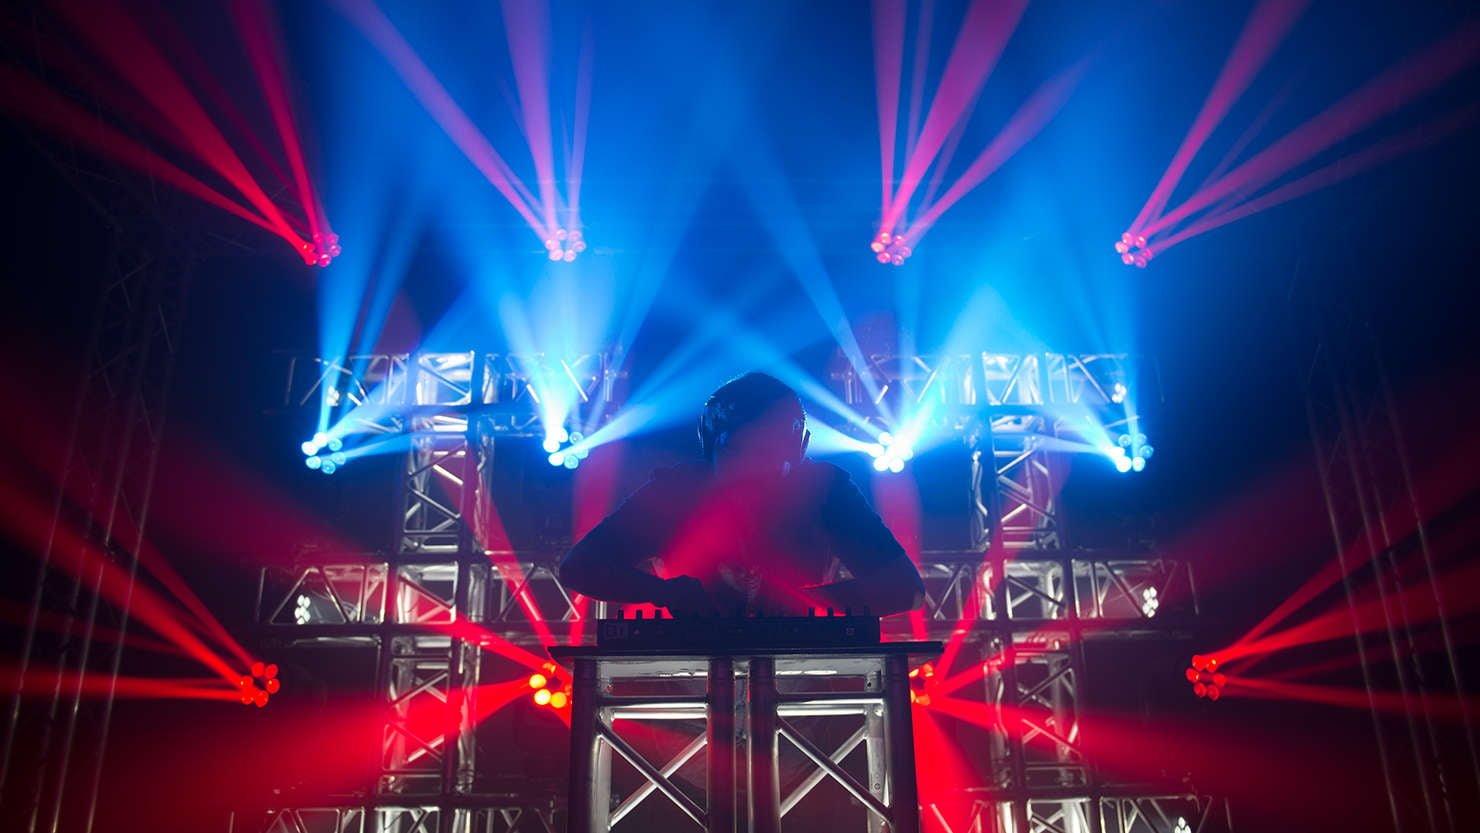 Chauvet DJ Intimidator Trio Moving Head 2